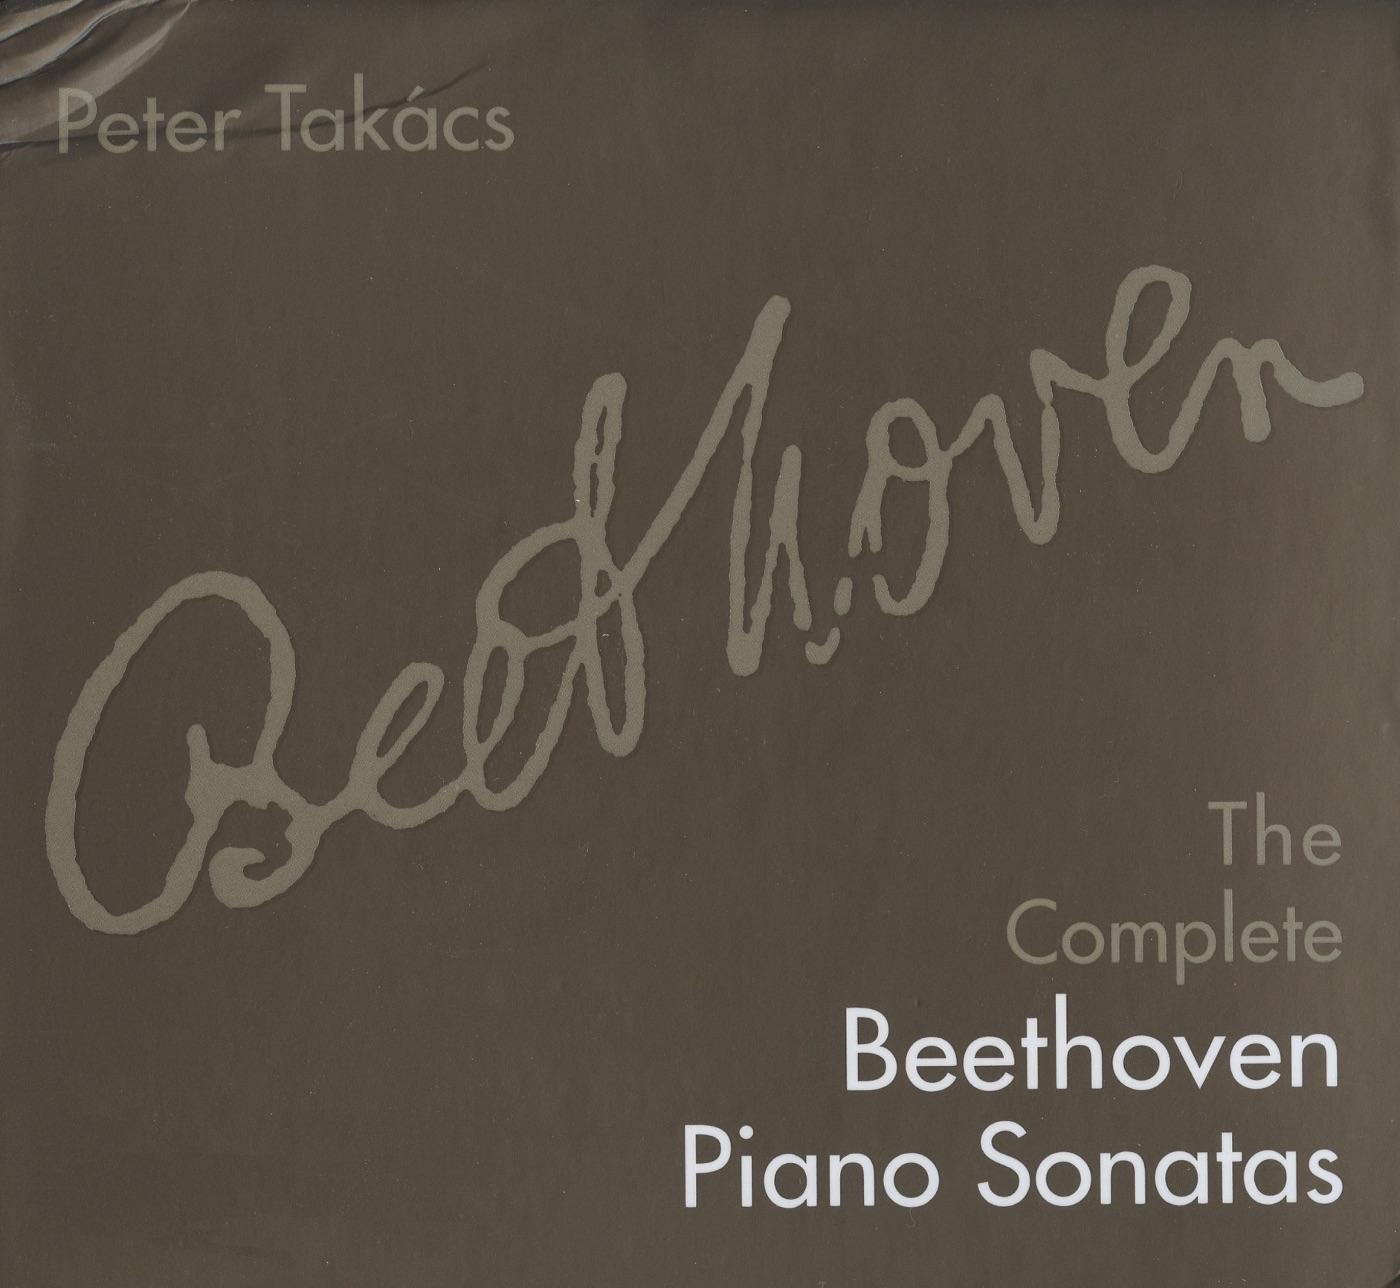 Piano Sonata No. 23 in F Minor, Op. 57,